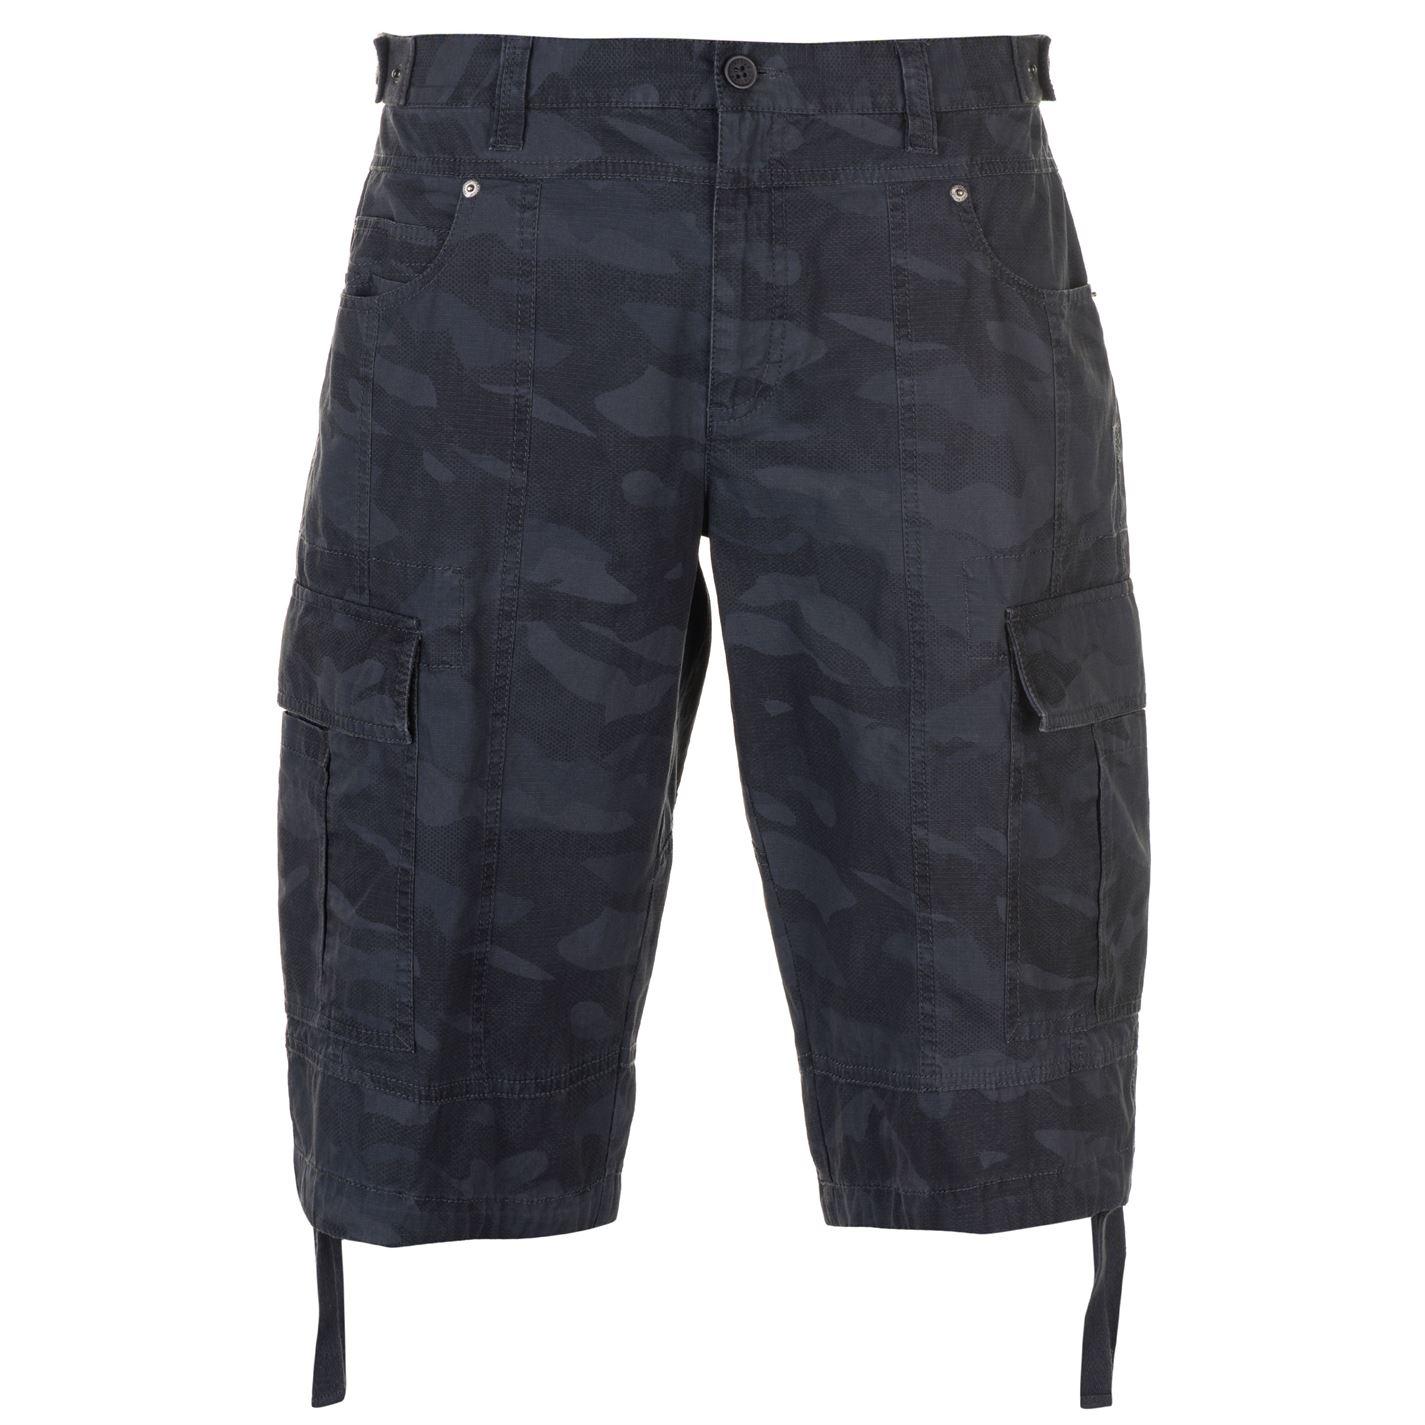 Firetrap Cargo Shorts Mens